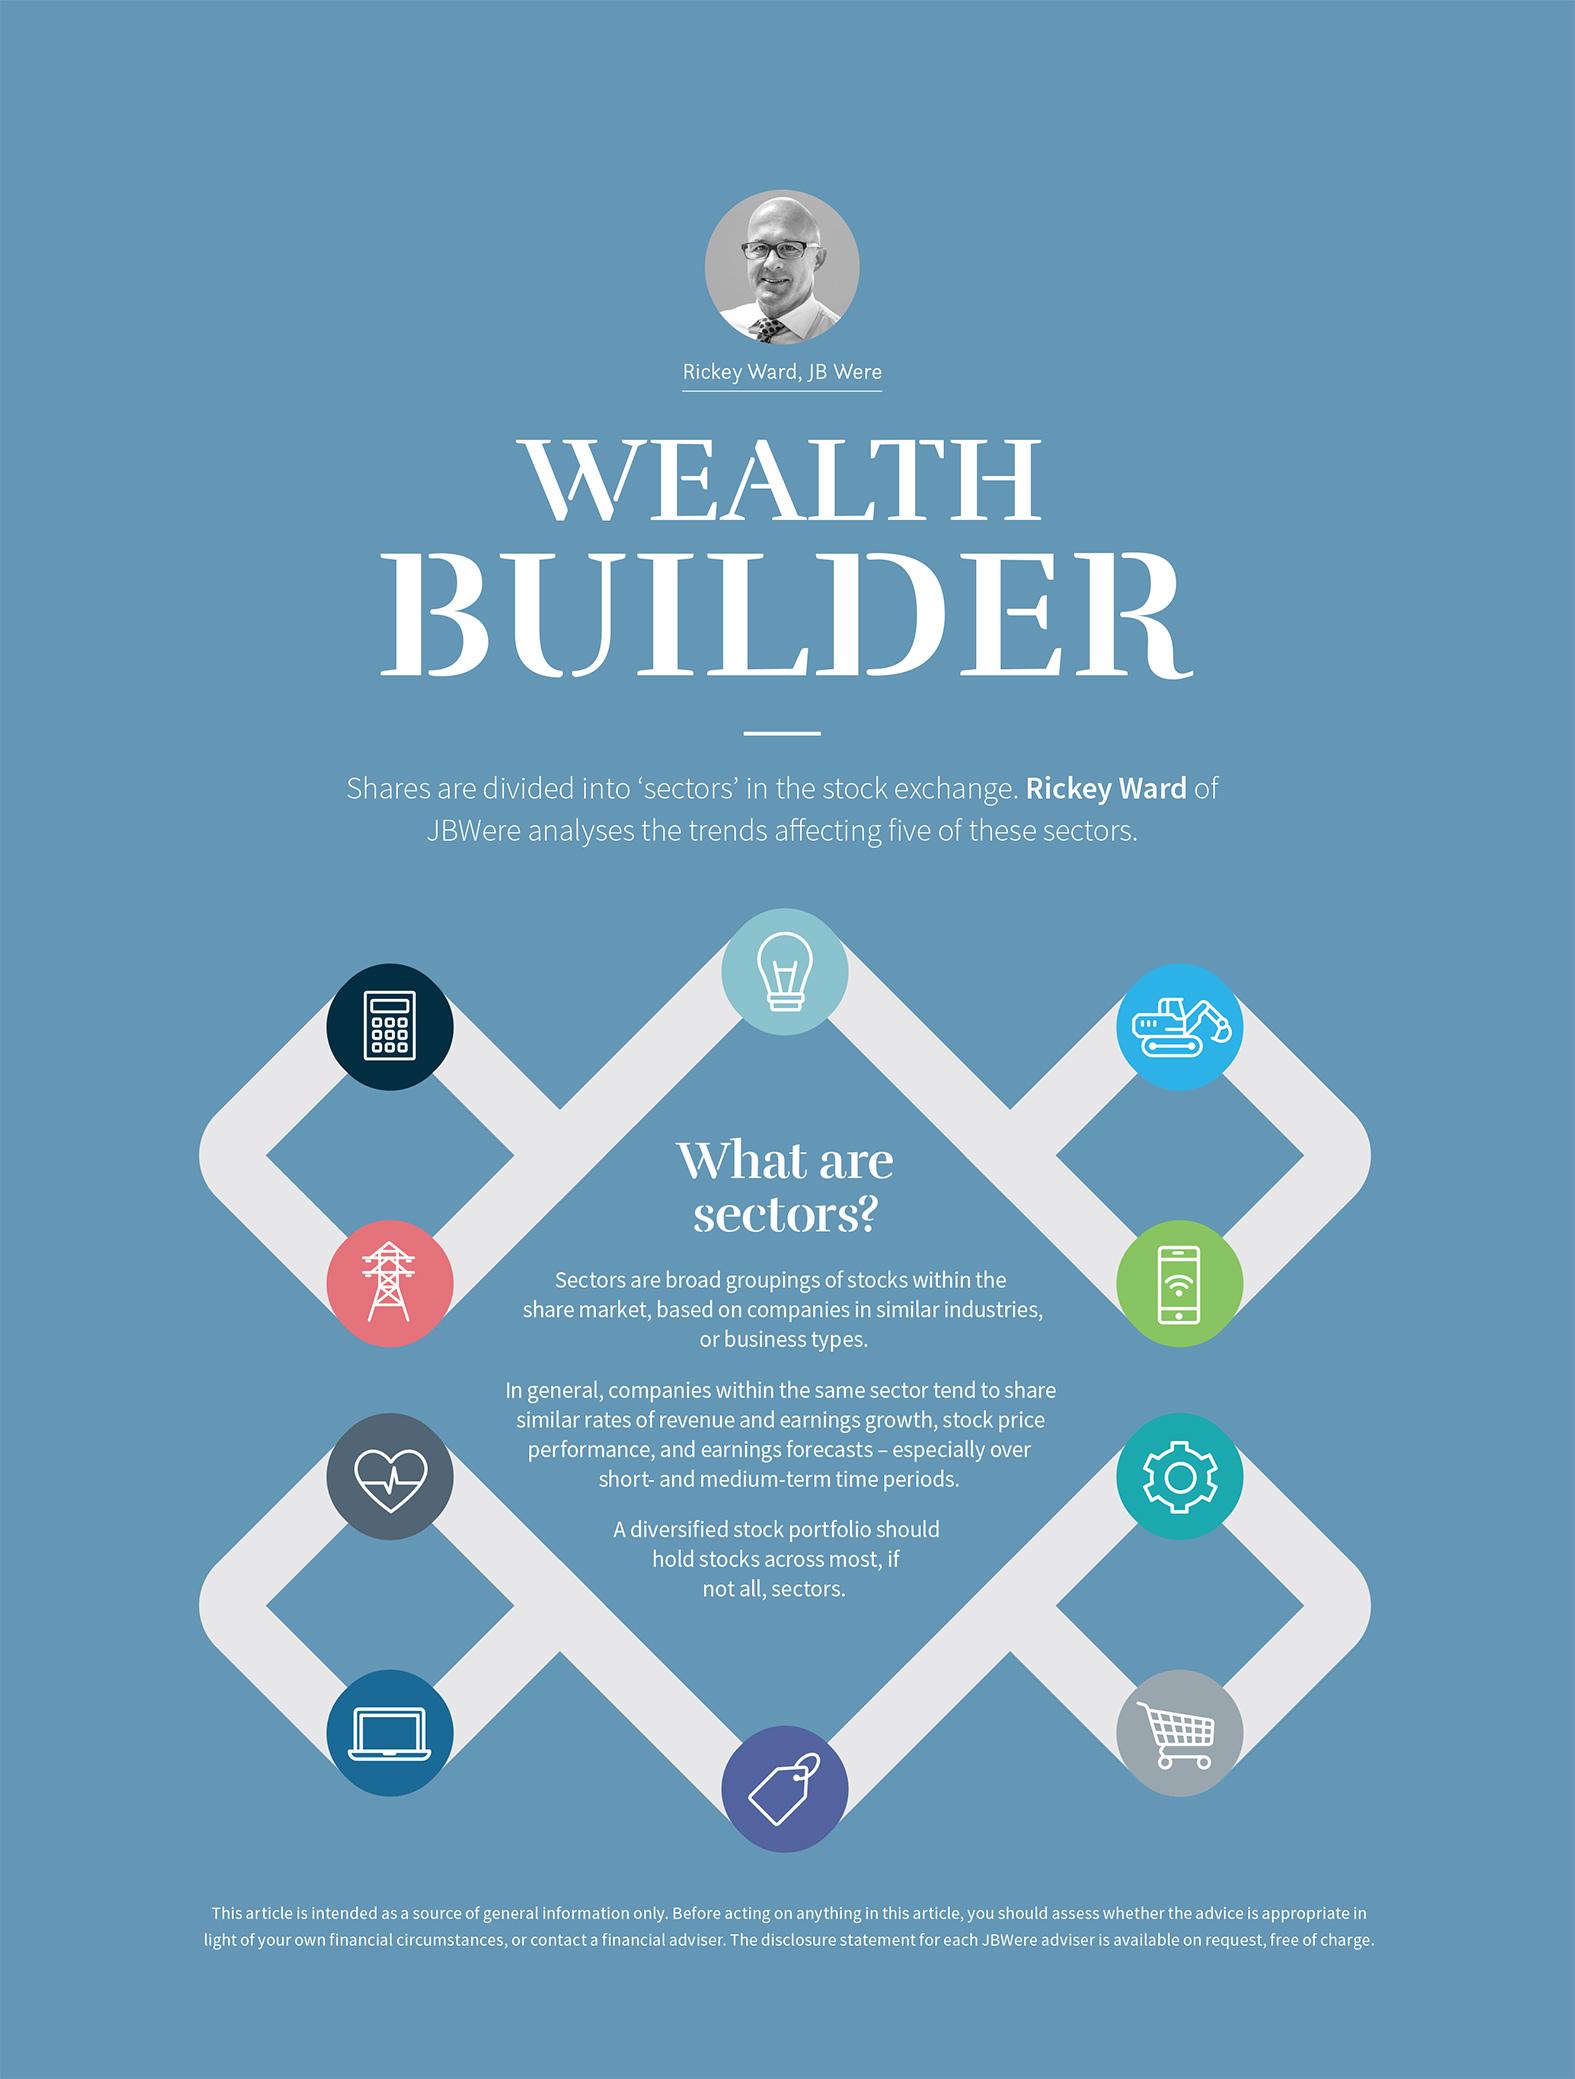 WEALTH BUILDER FRONT.jpg